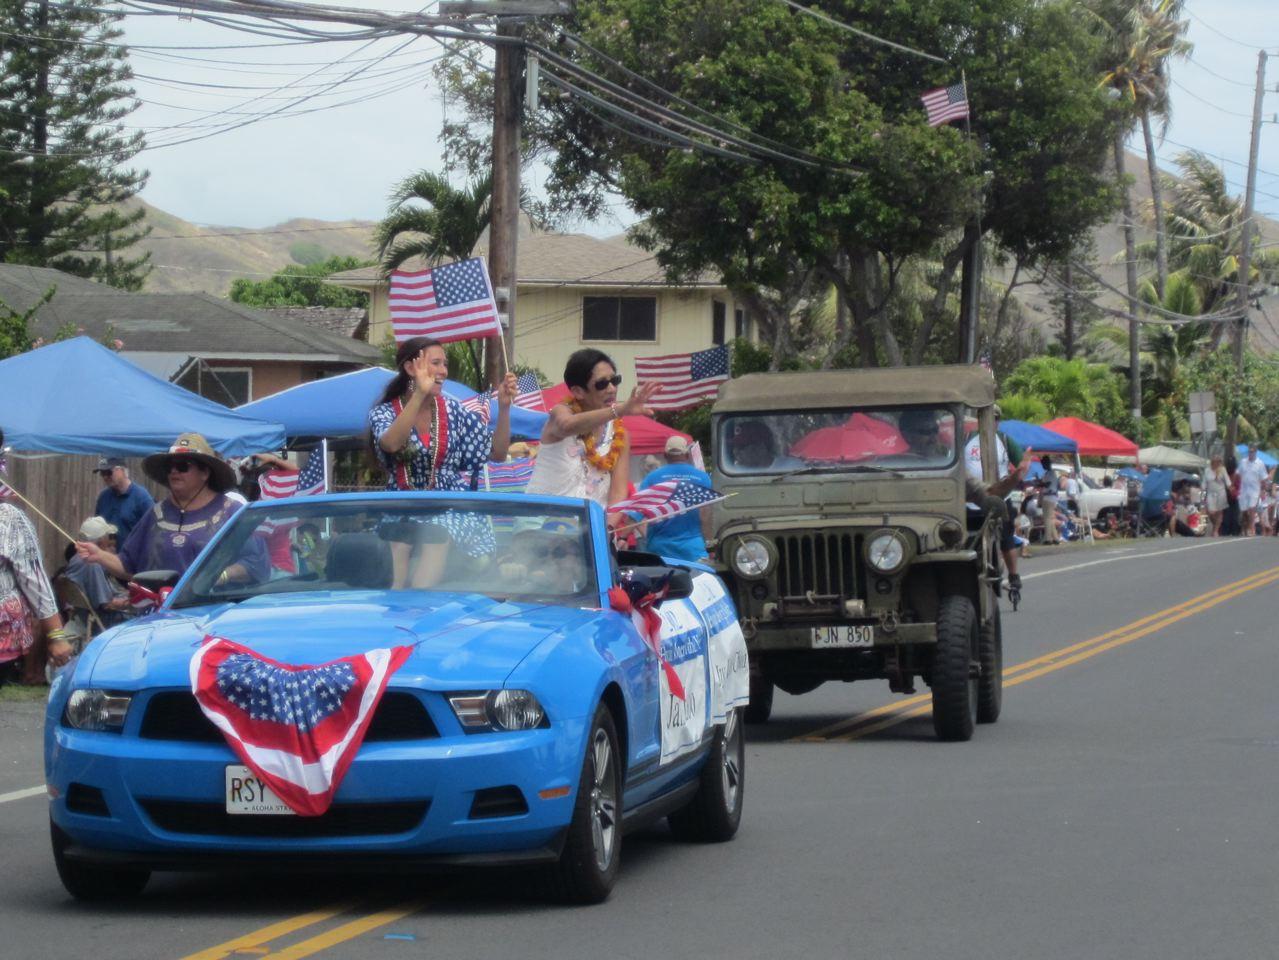 Photo of the Kailua July 4th Parade